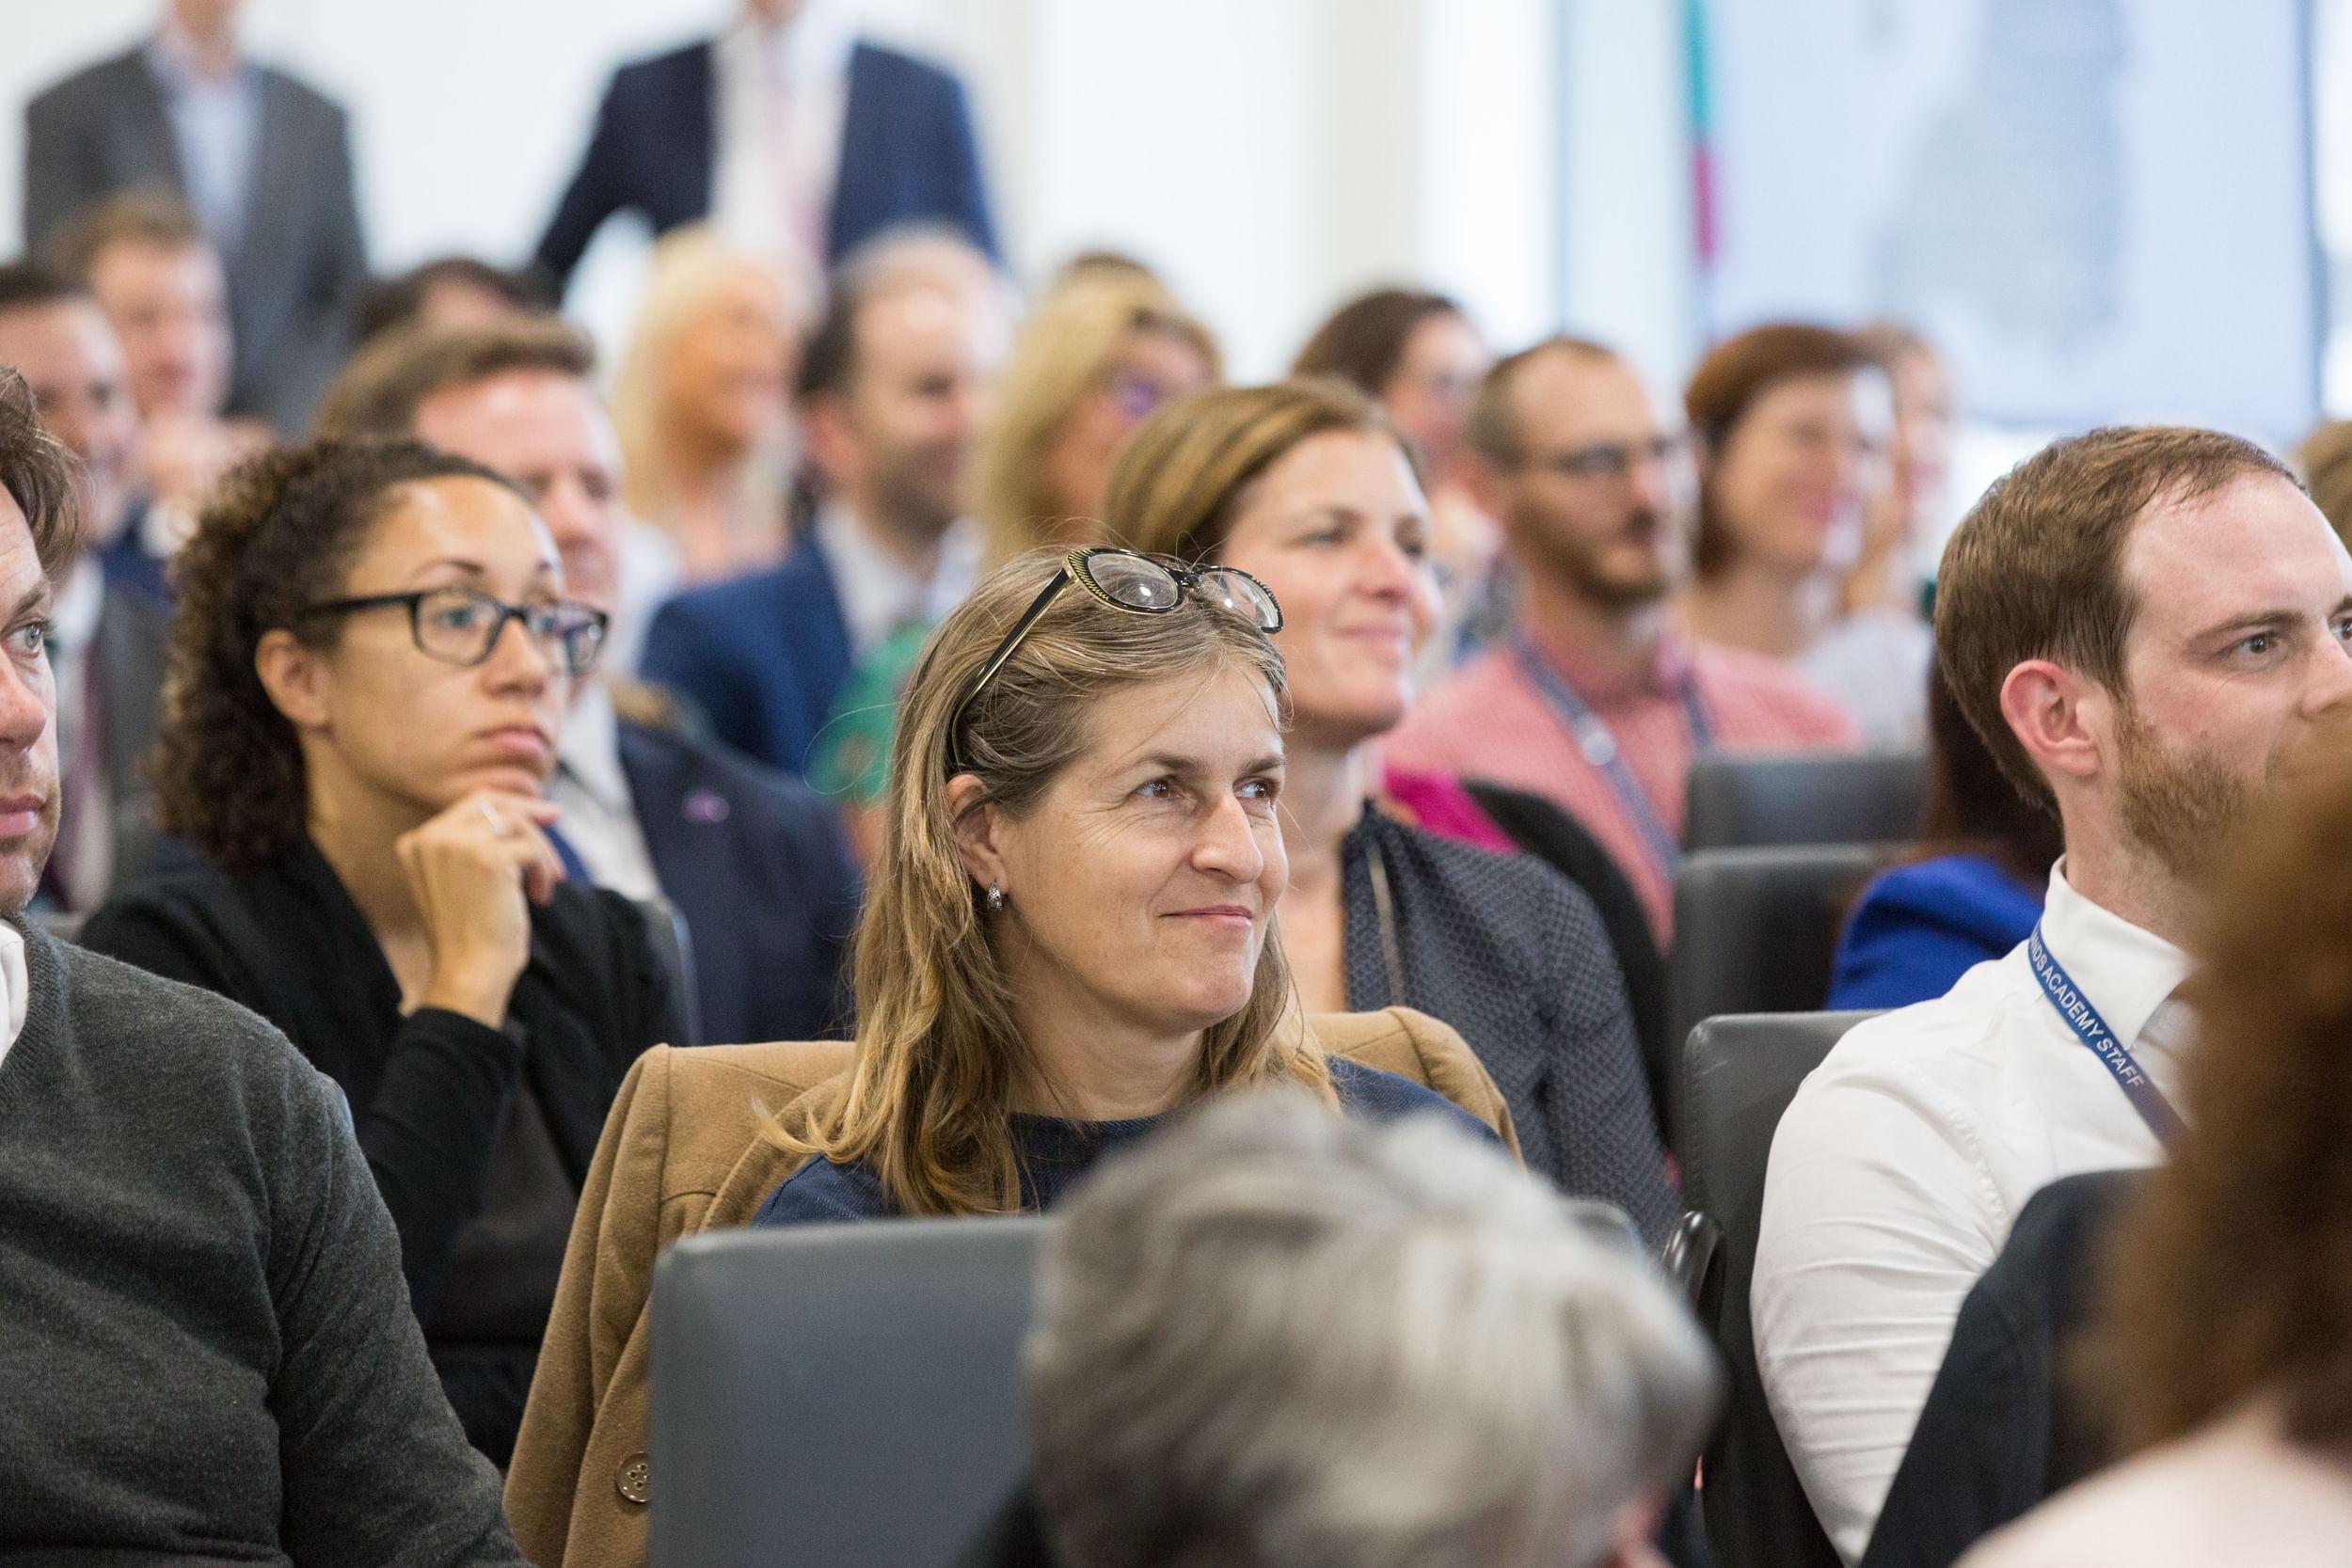 Audience enjoying a presentation